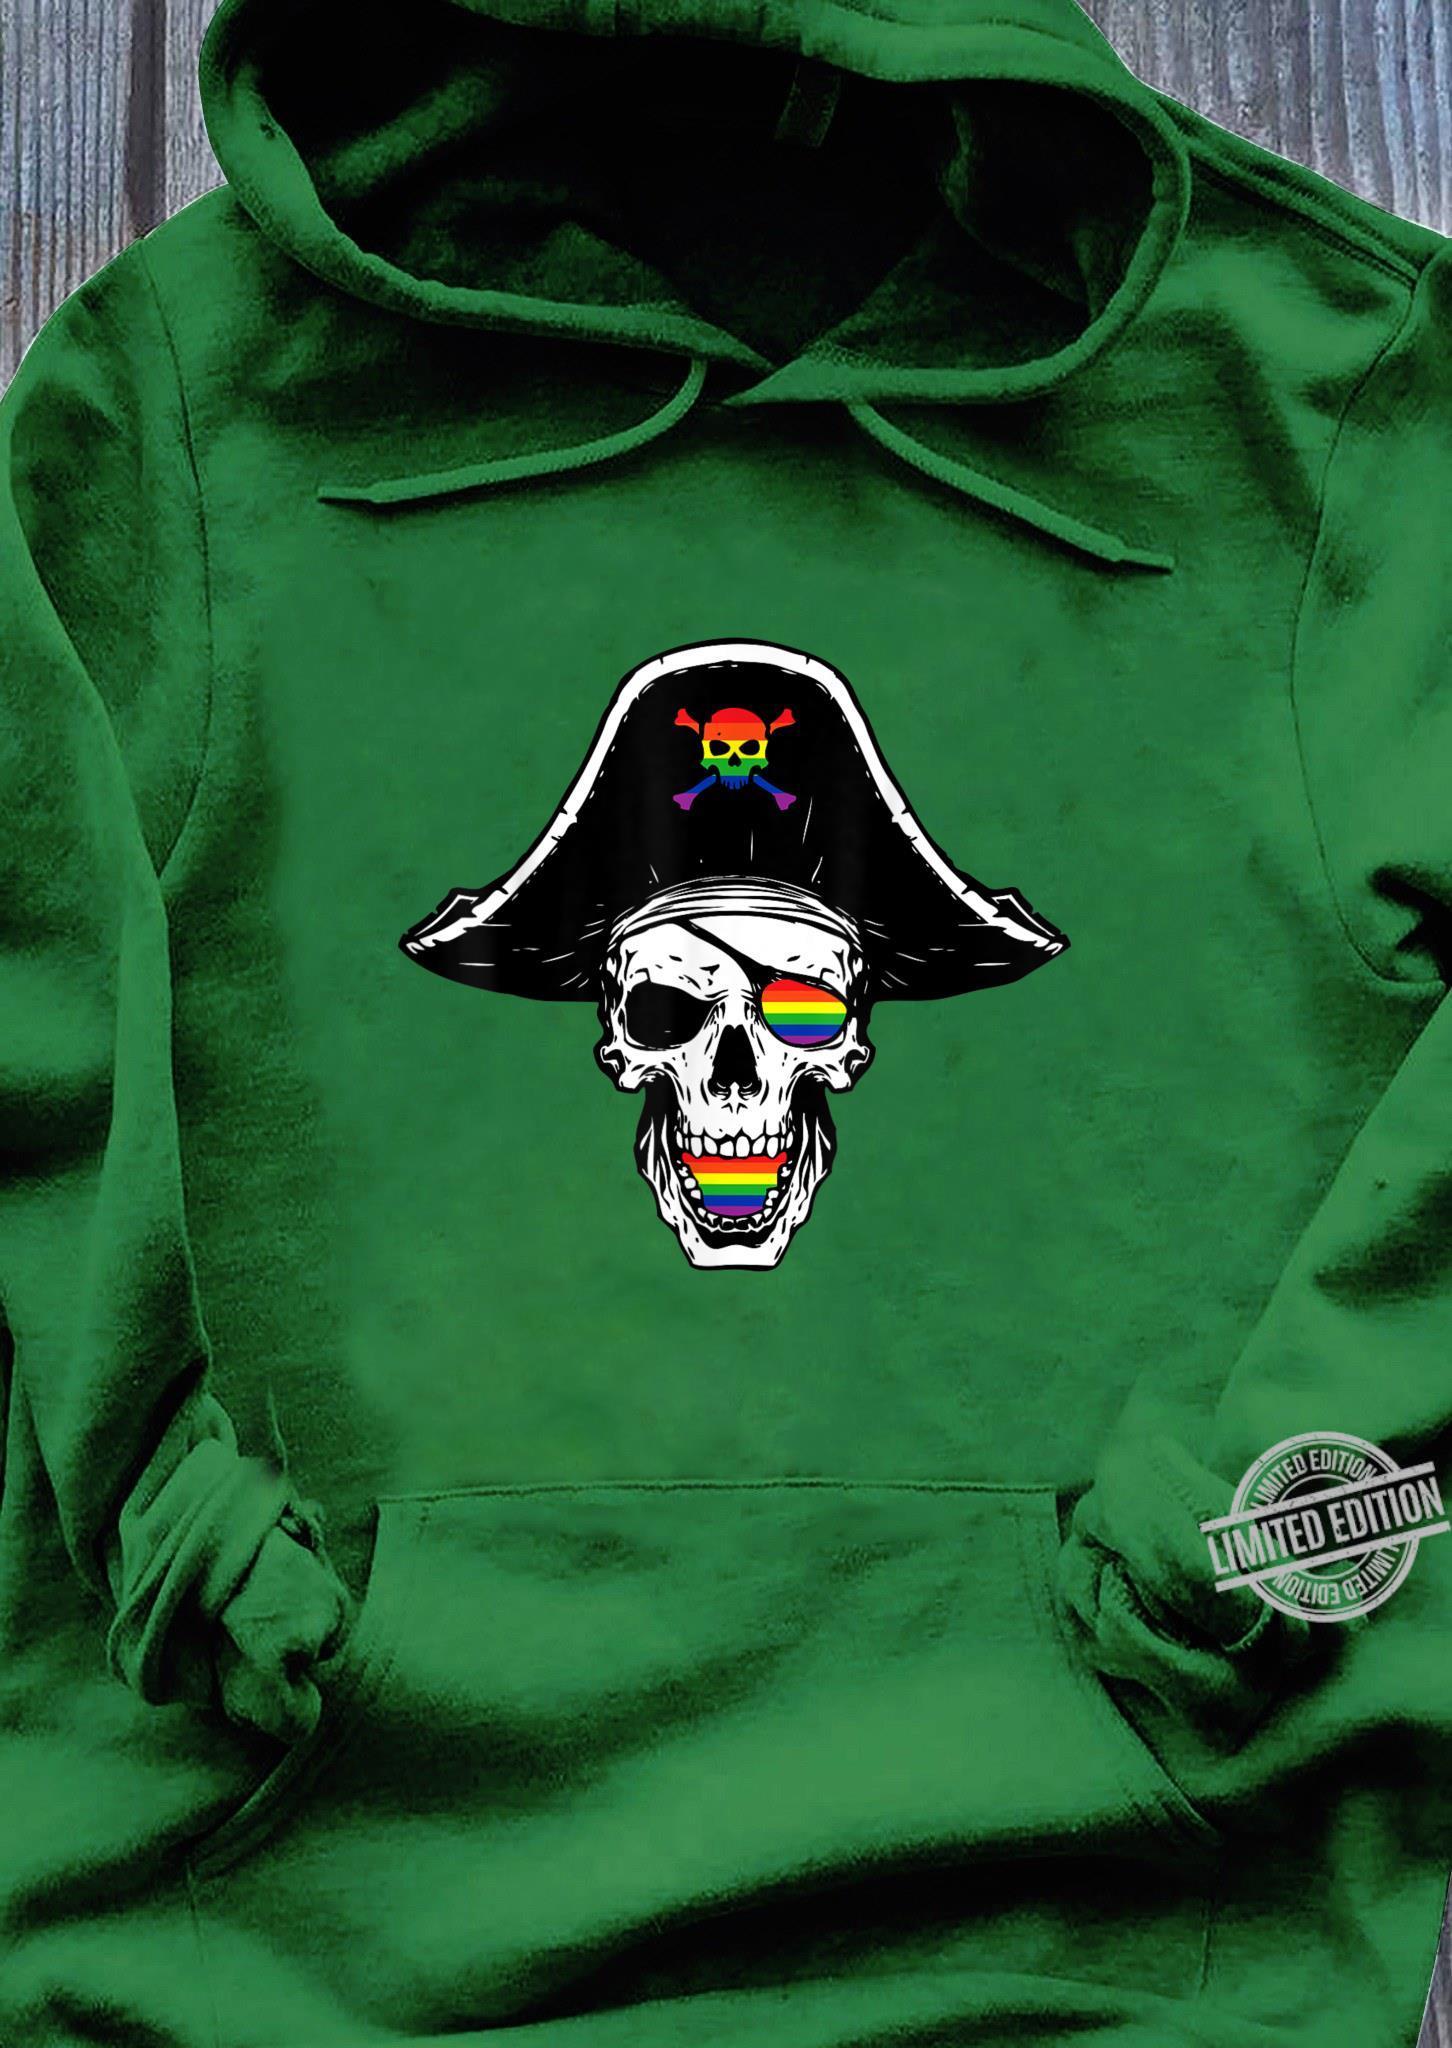 Gay Pirate Skull Crosbones Pride Flag LGBTQ Cool LGBT Shirt hoodie